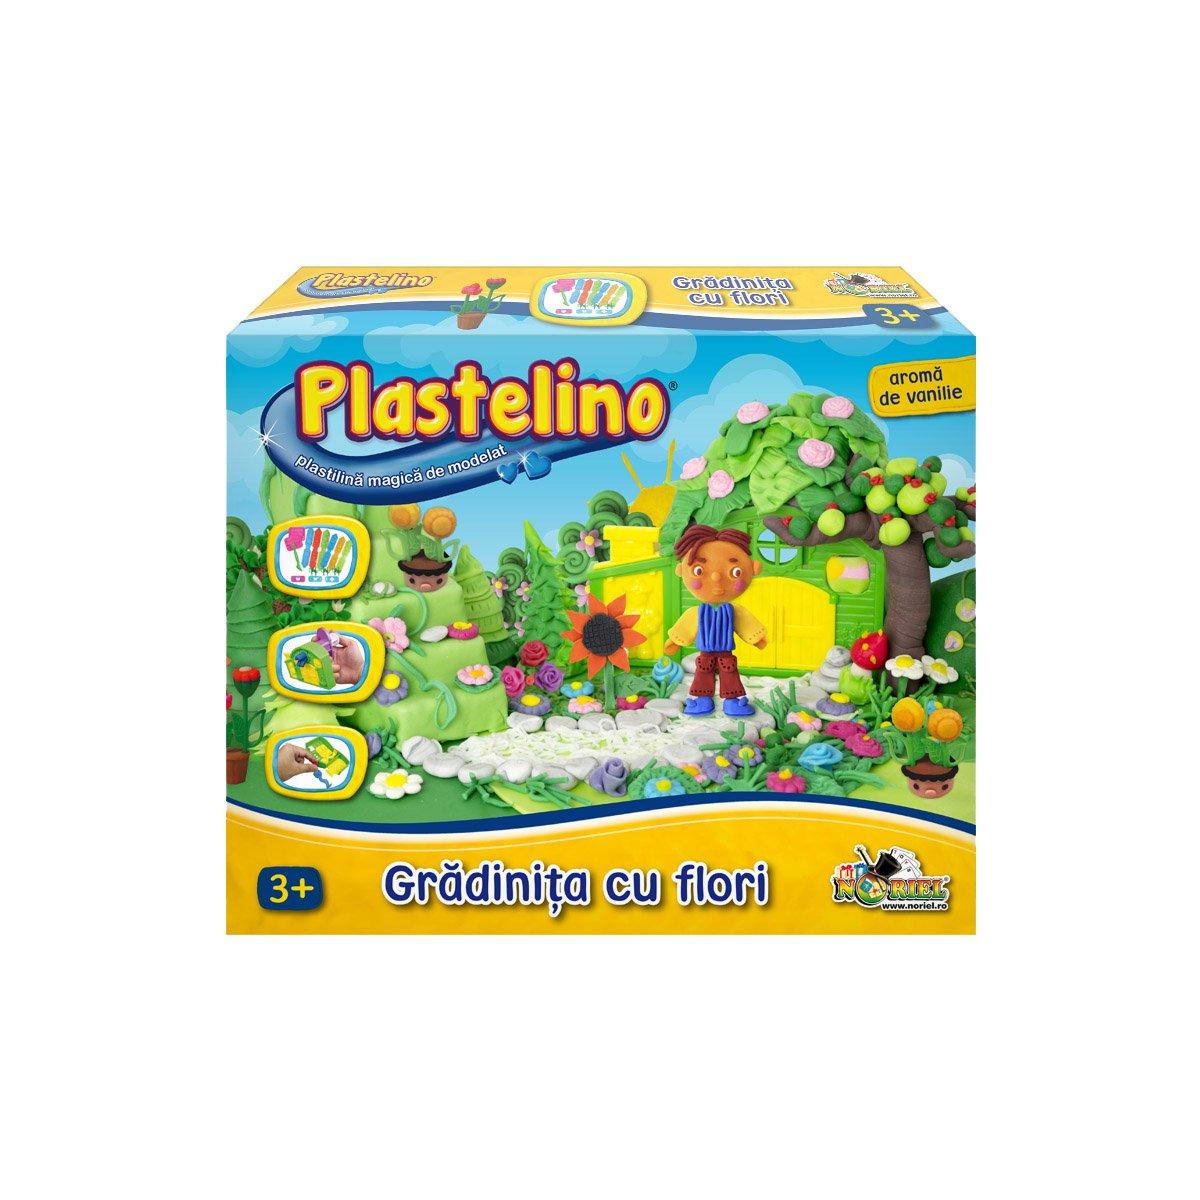 Plastelino - Gradinita cu Flori din Plastilina II